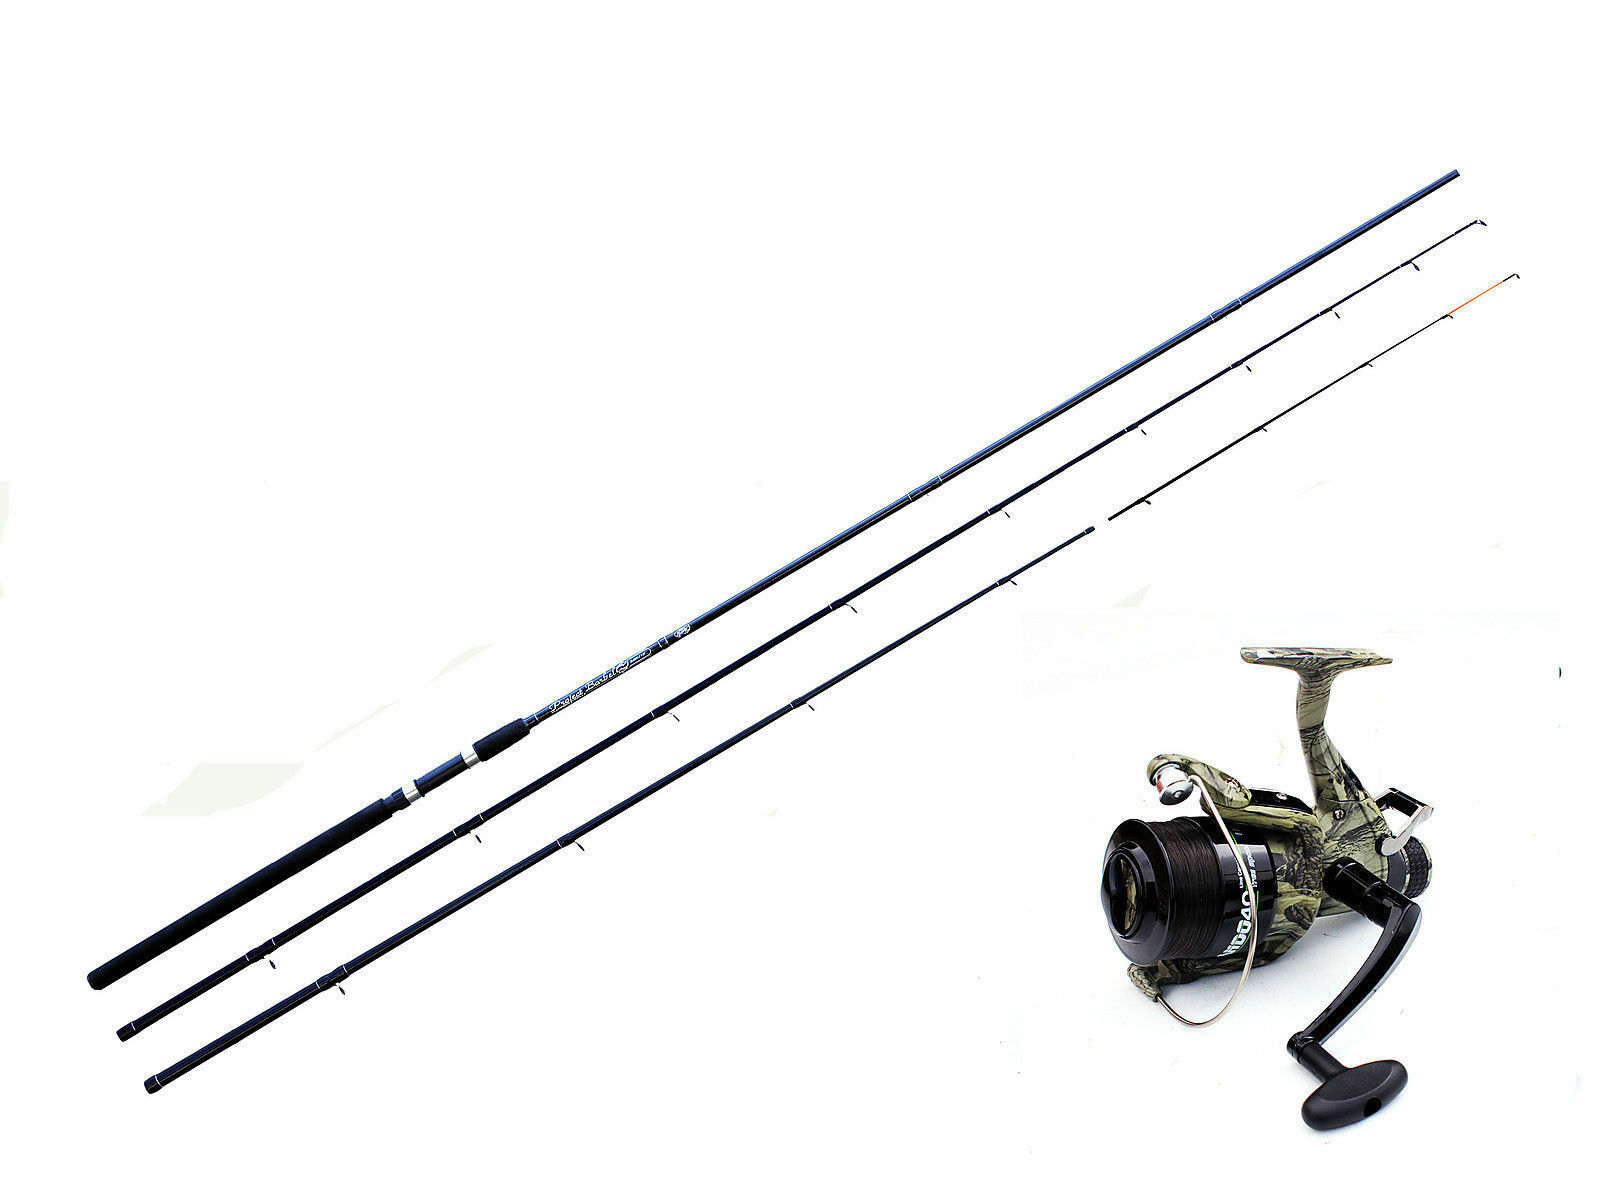 Specialist Barbel Avon Fishing Rod -12ft 2 top & Camo Freespool 40 reel & line